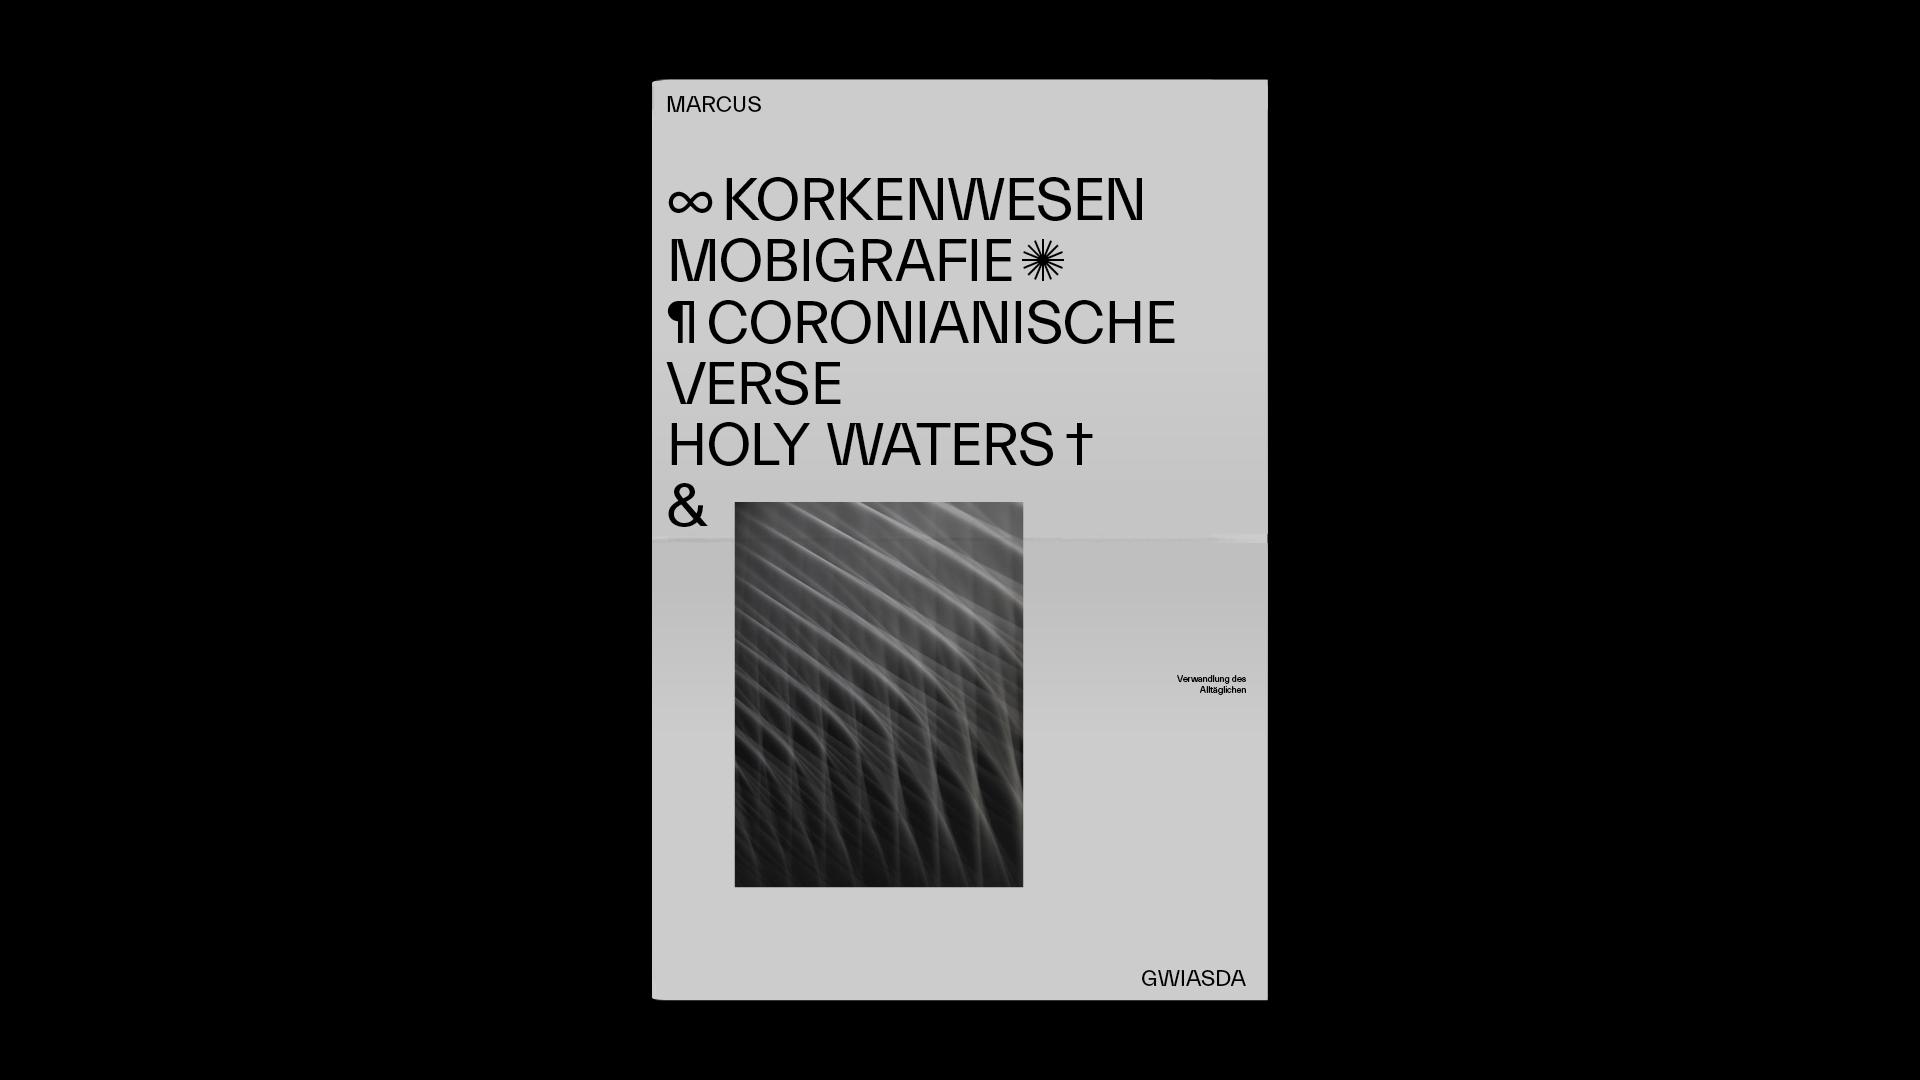 VISEE_MGW_CD-Entwicklung_Praesentation_v0226